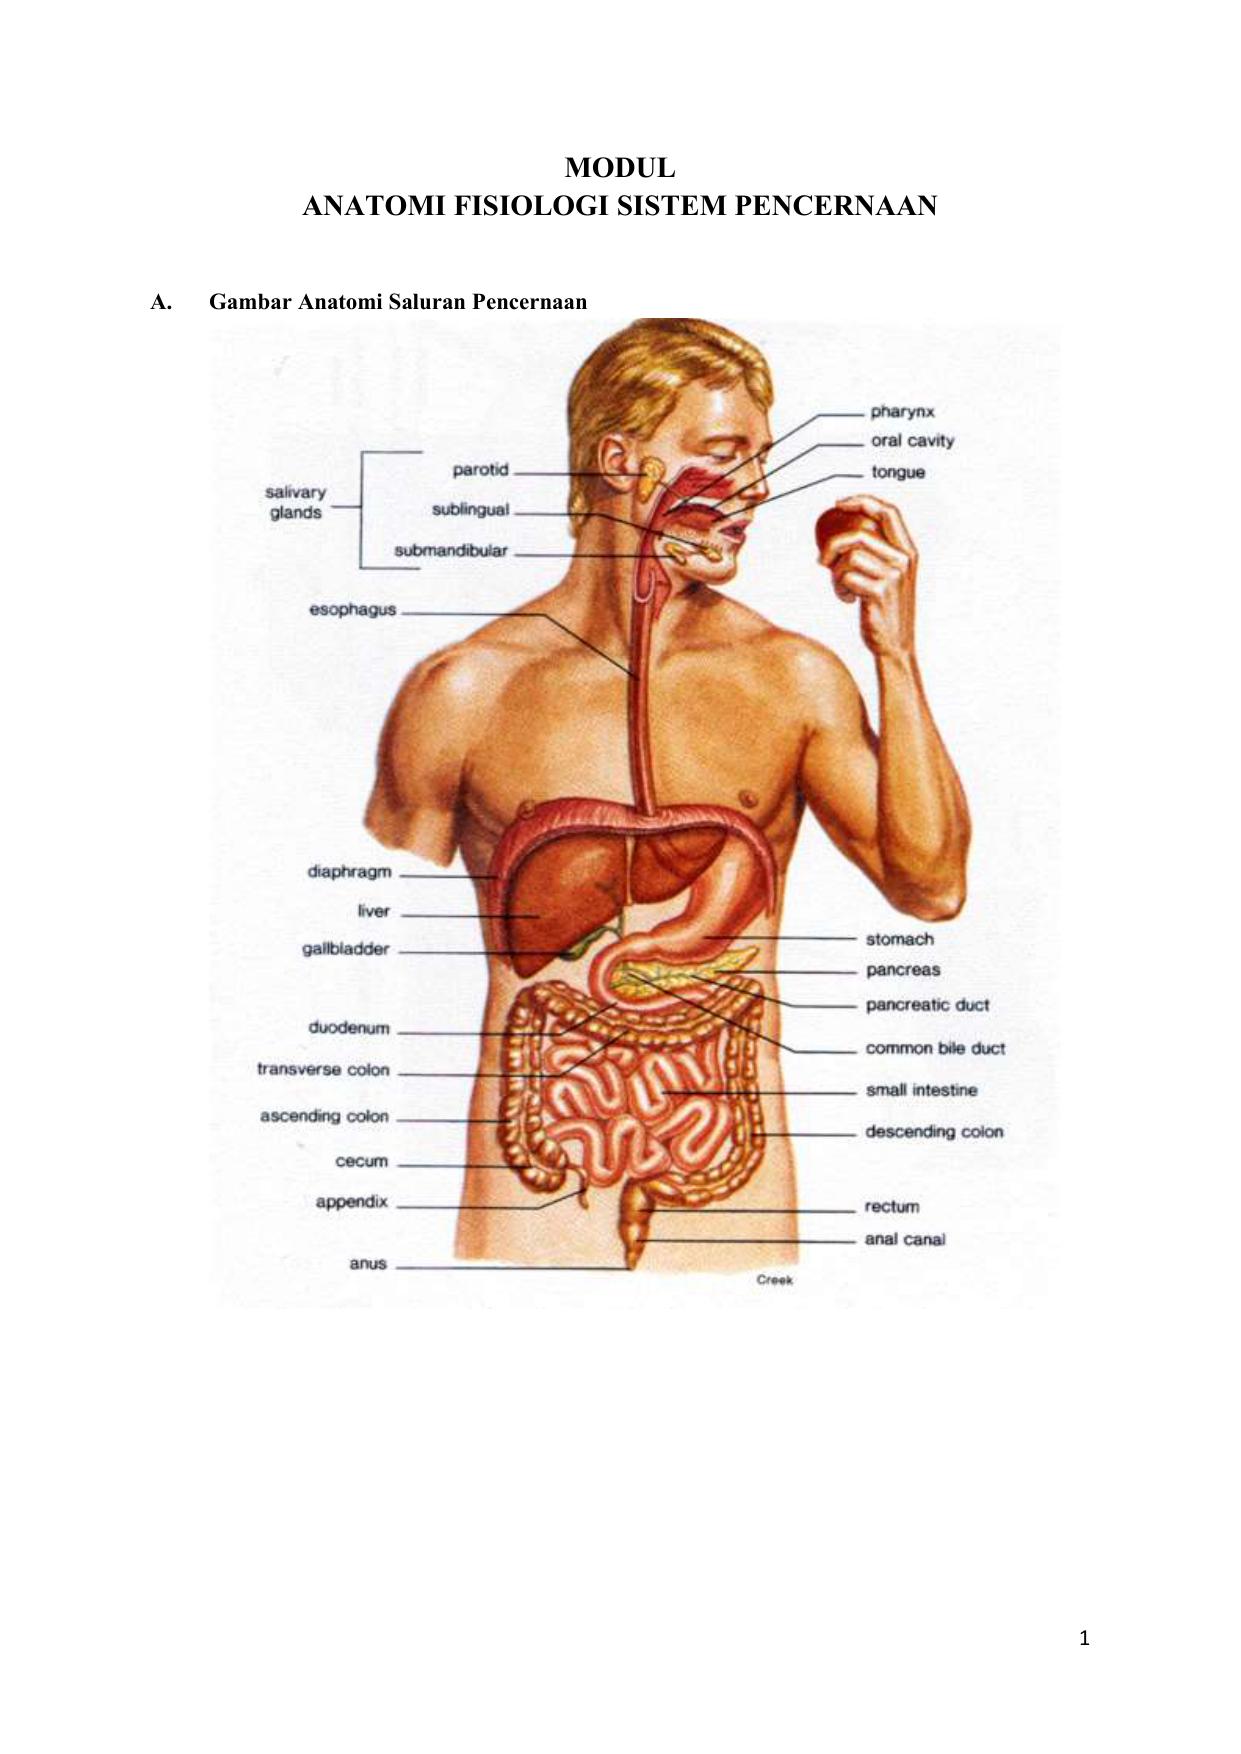 Modul Anatomi Fisiologi Sistem Pencernaan